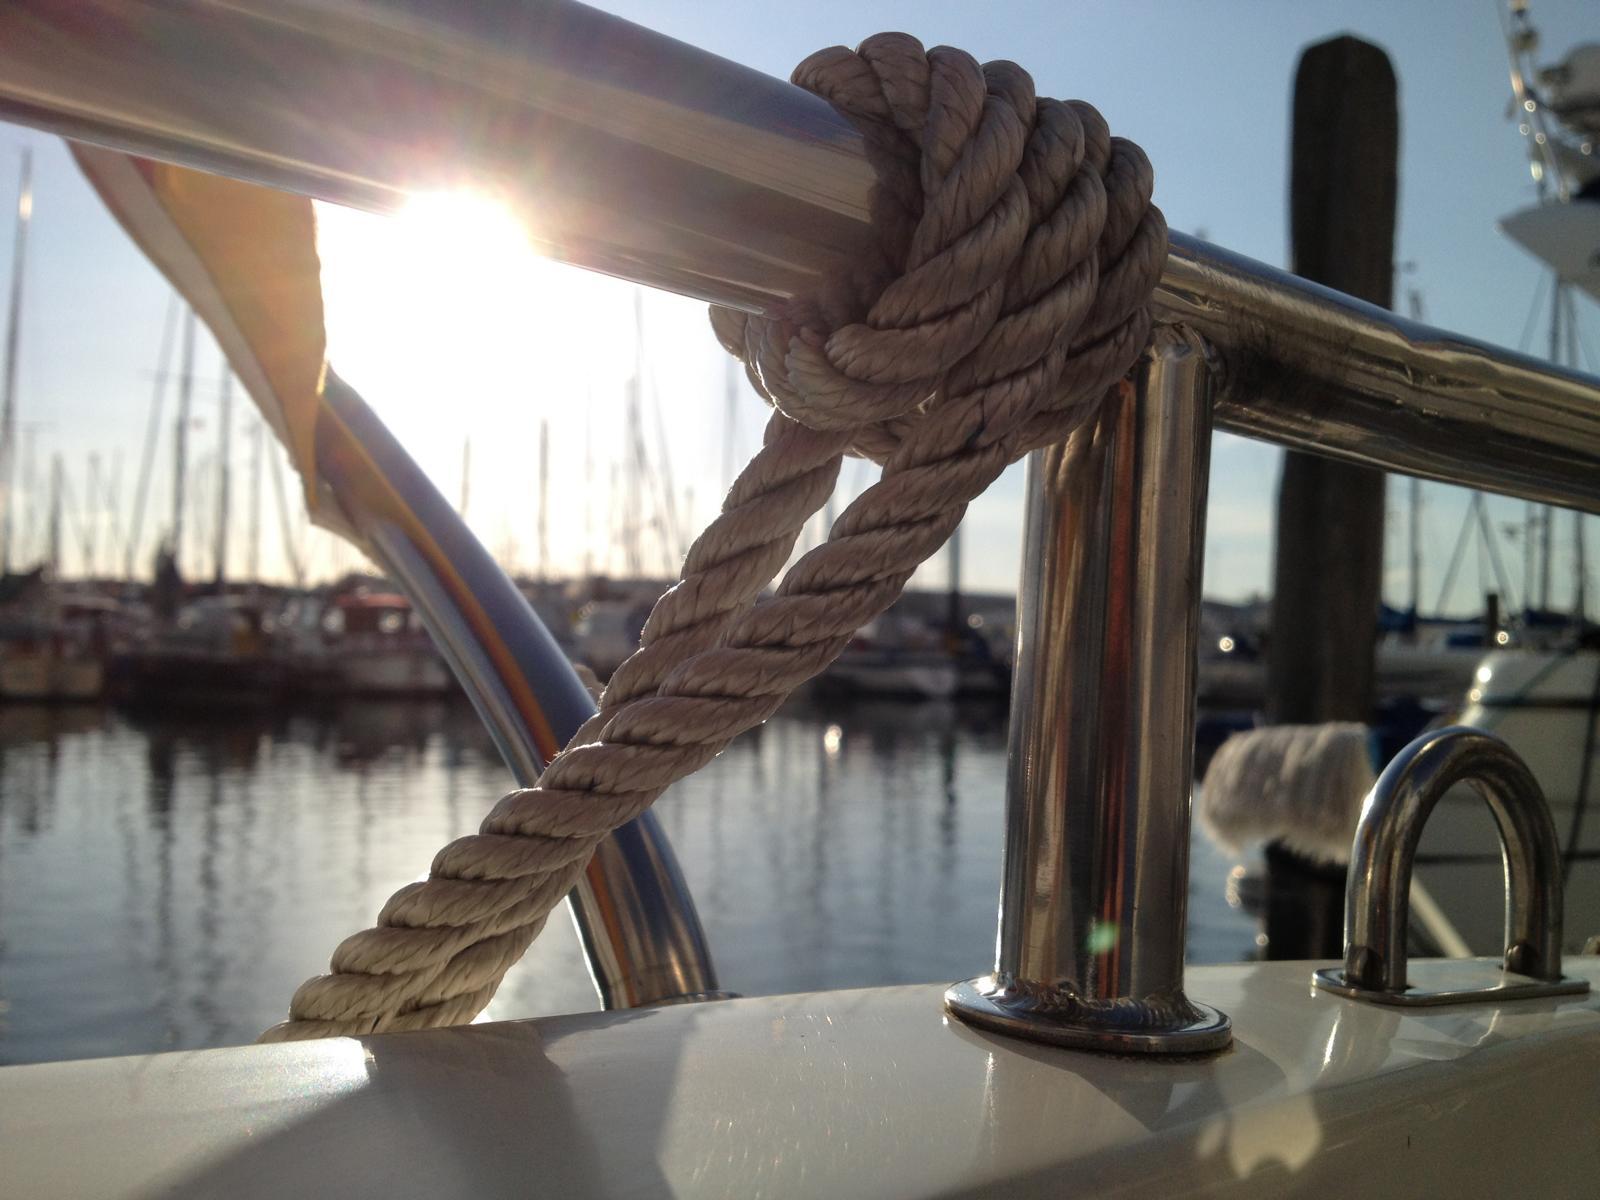 Inselimpression - Monasteria Yachtclub Münster